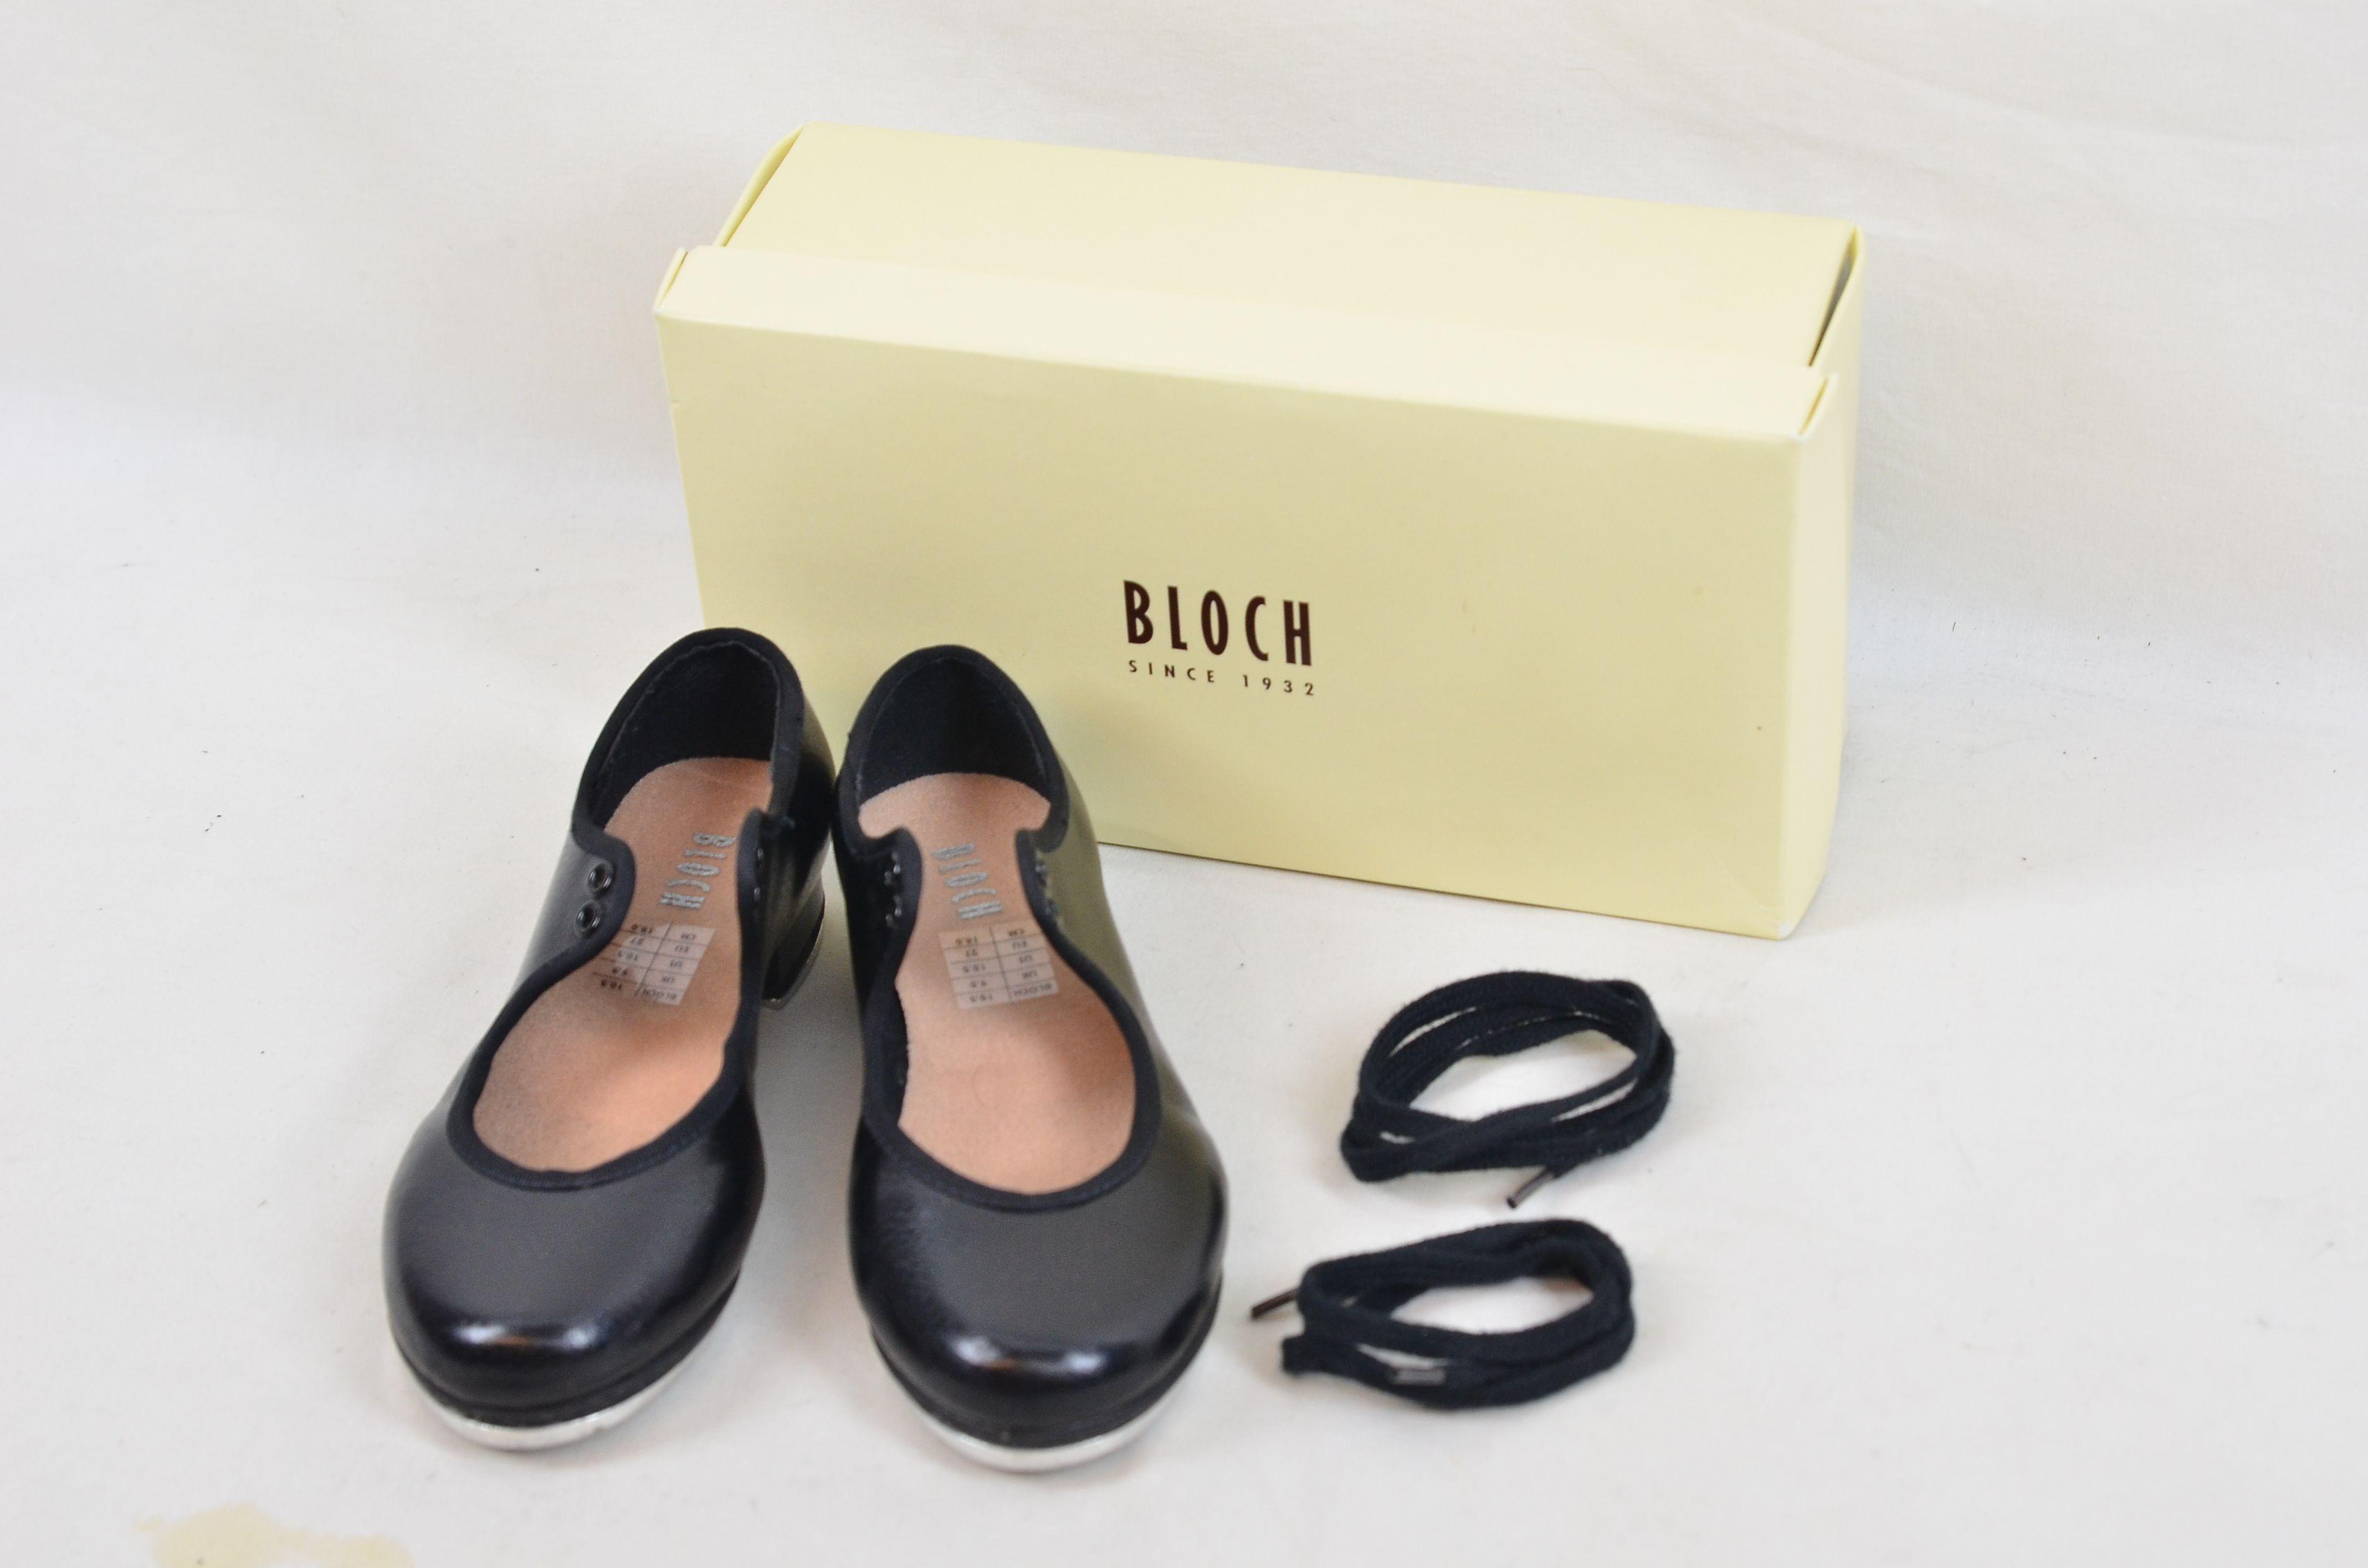 Bloch Timestep UK Size 9.5 Thumbnail 1